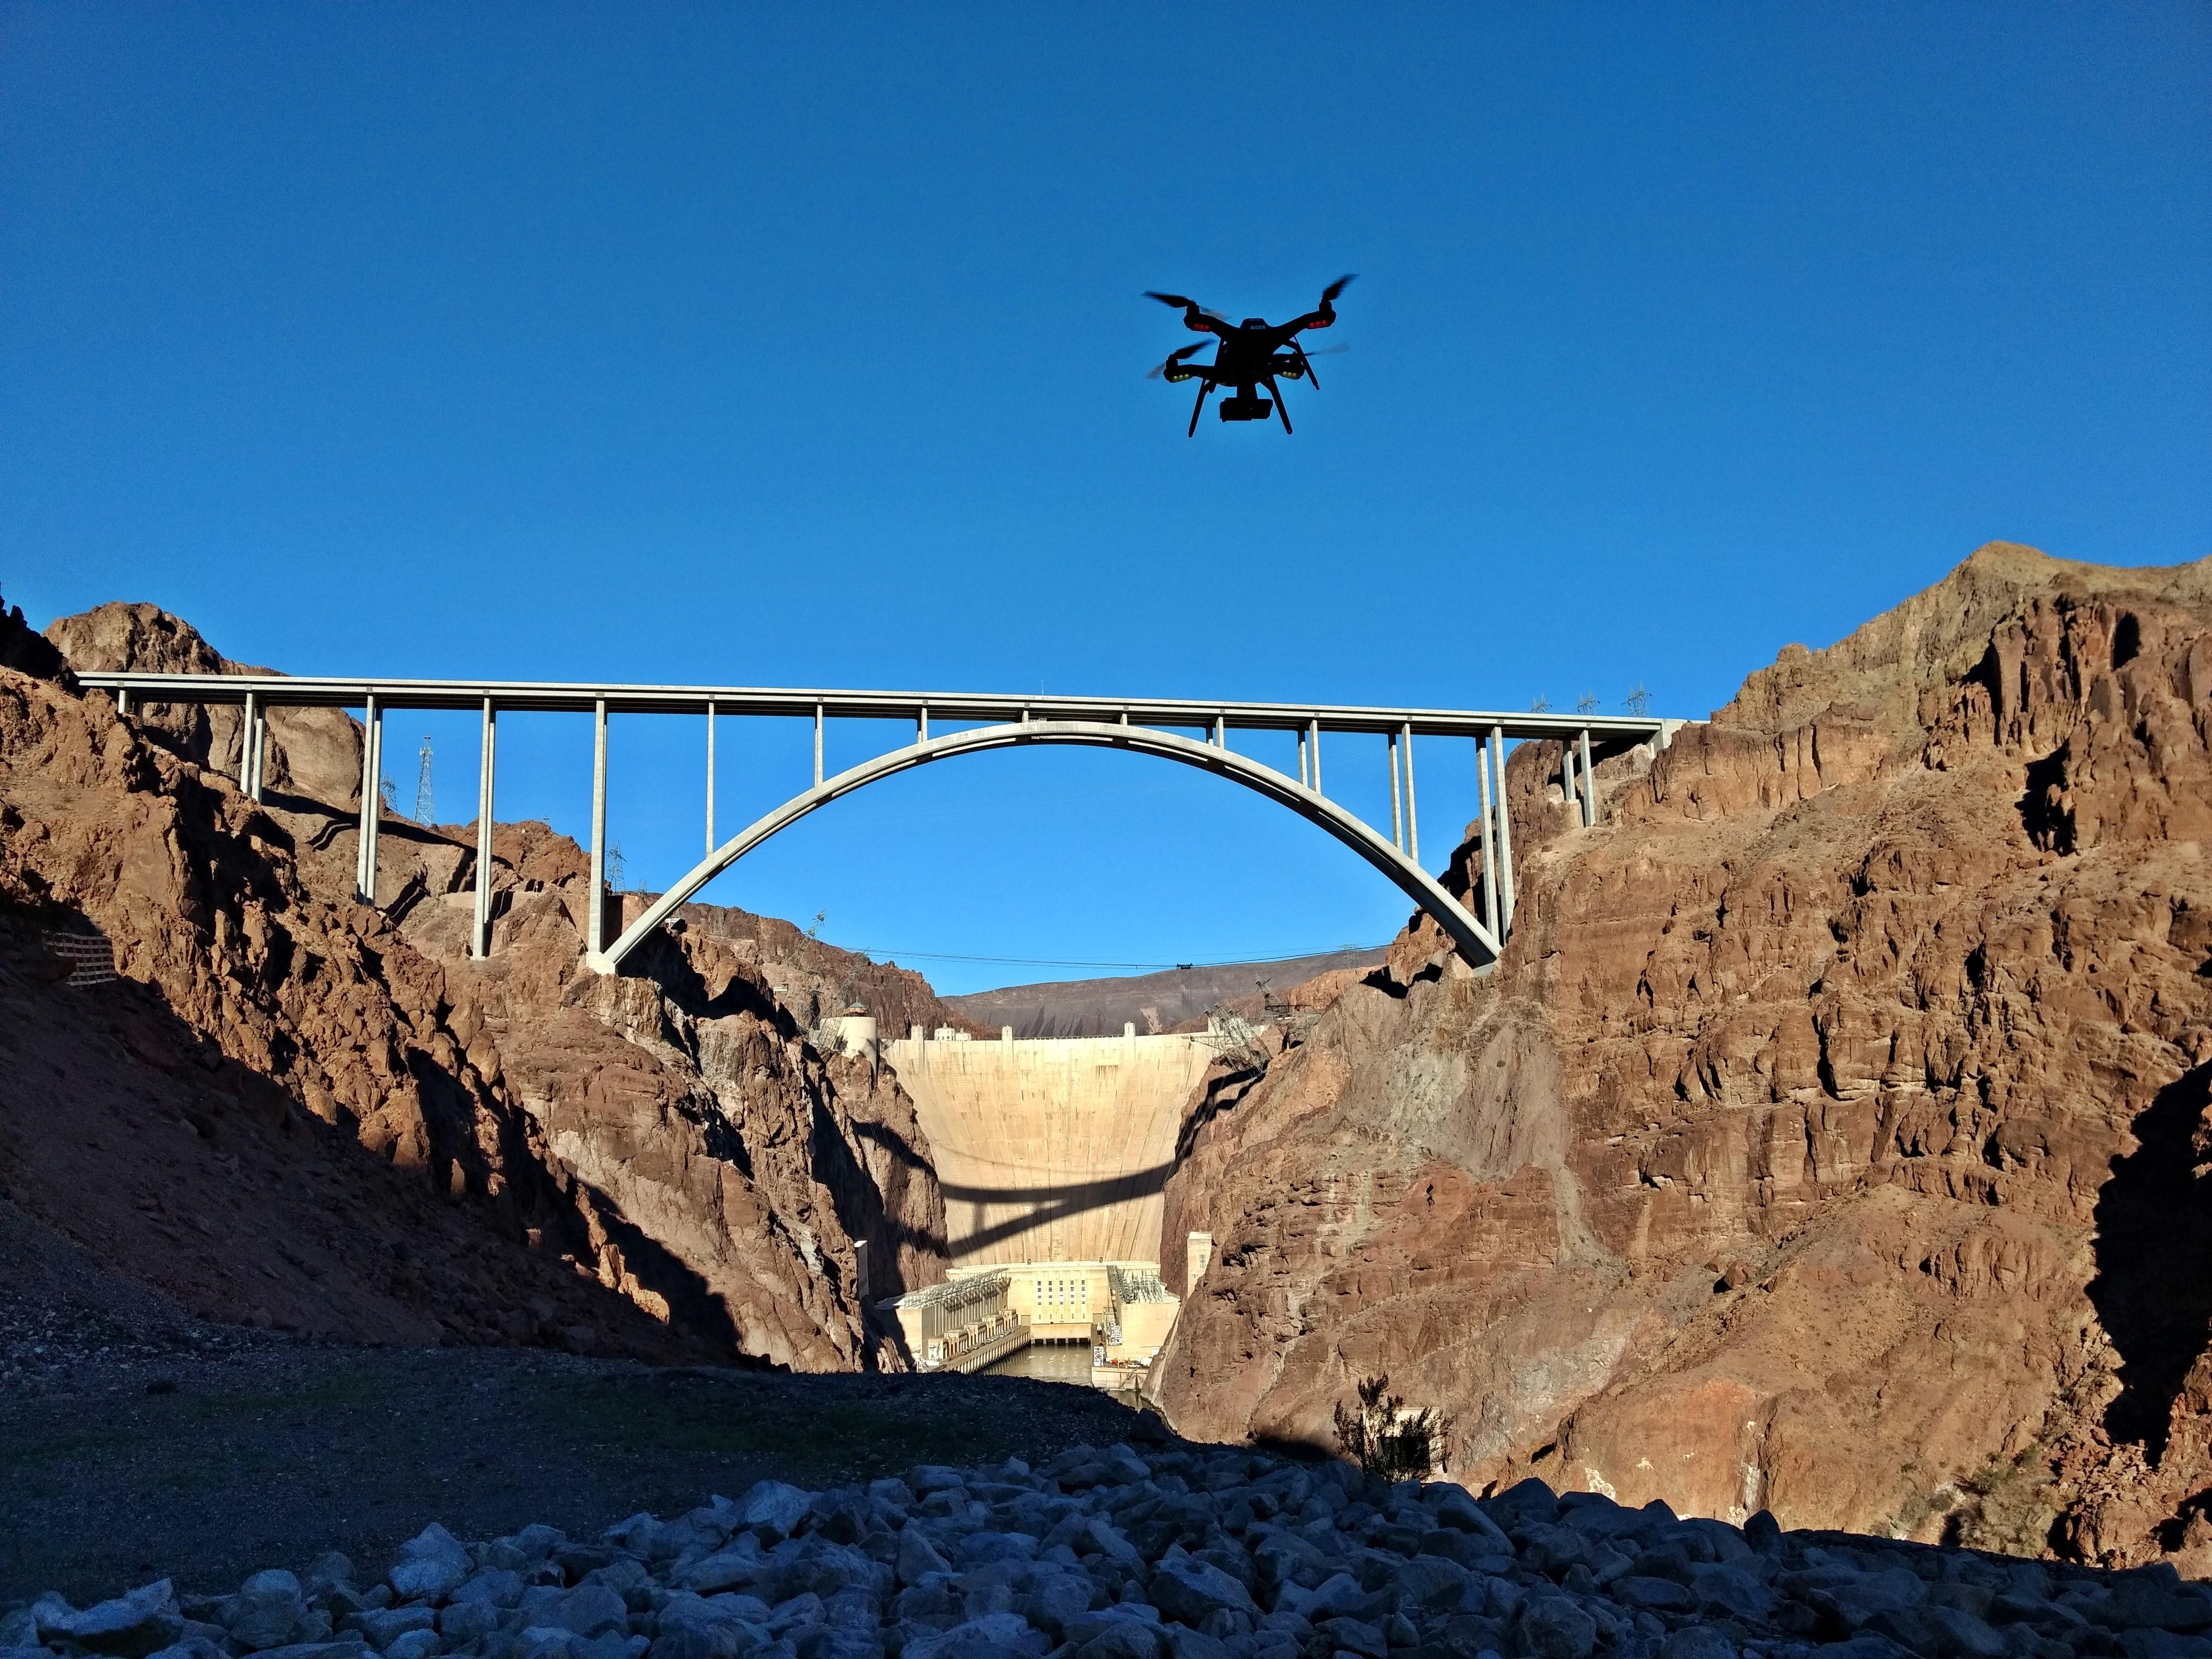 Operating a UAS at Hoover Dam, Nevada/Arizona.